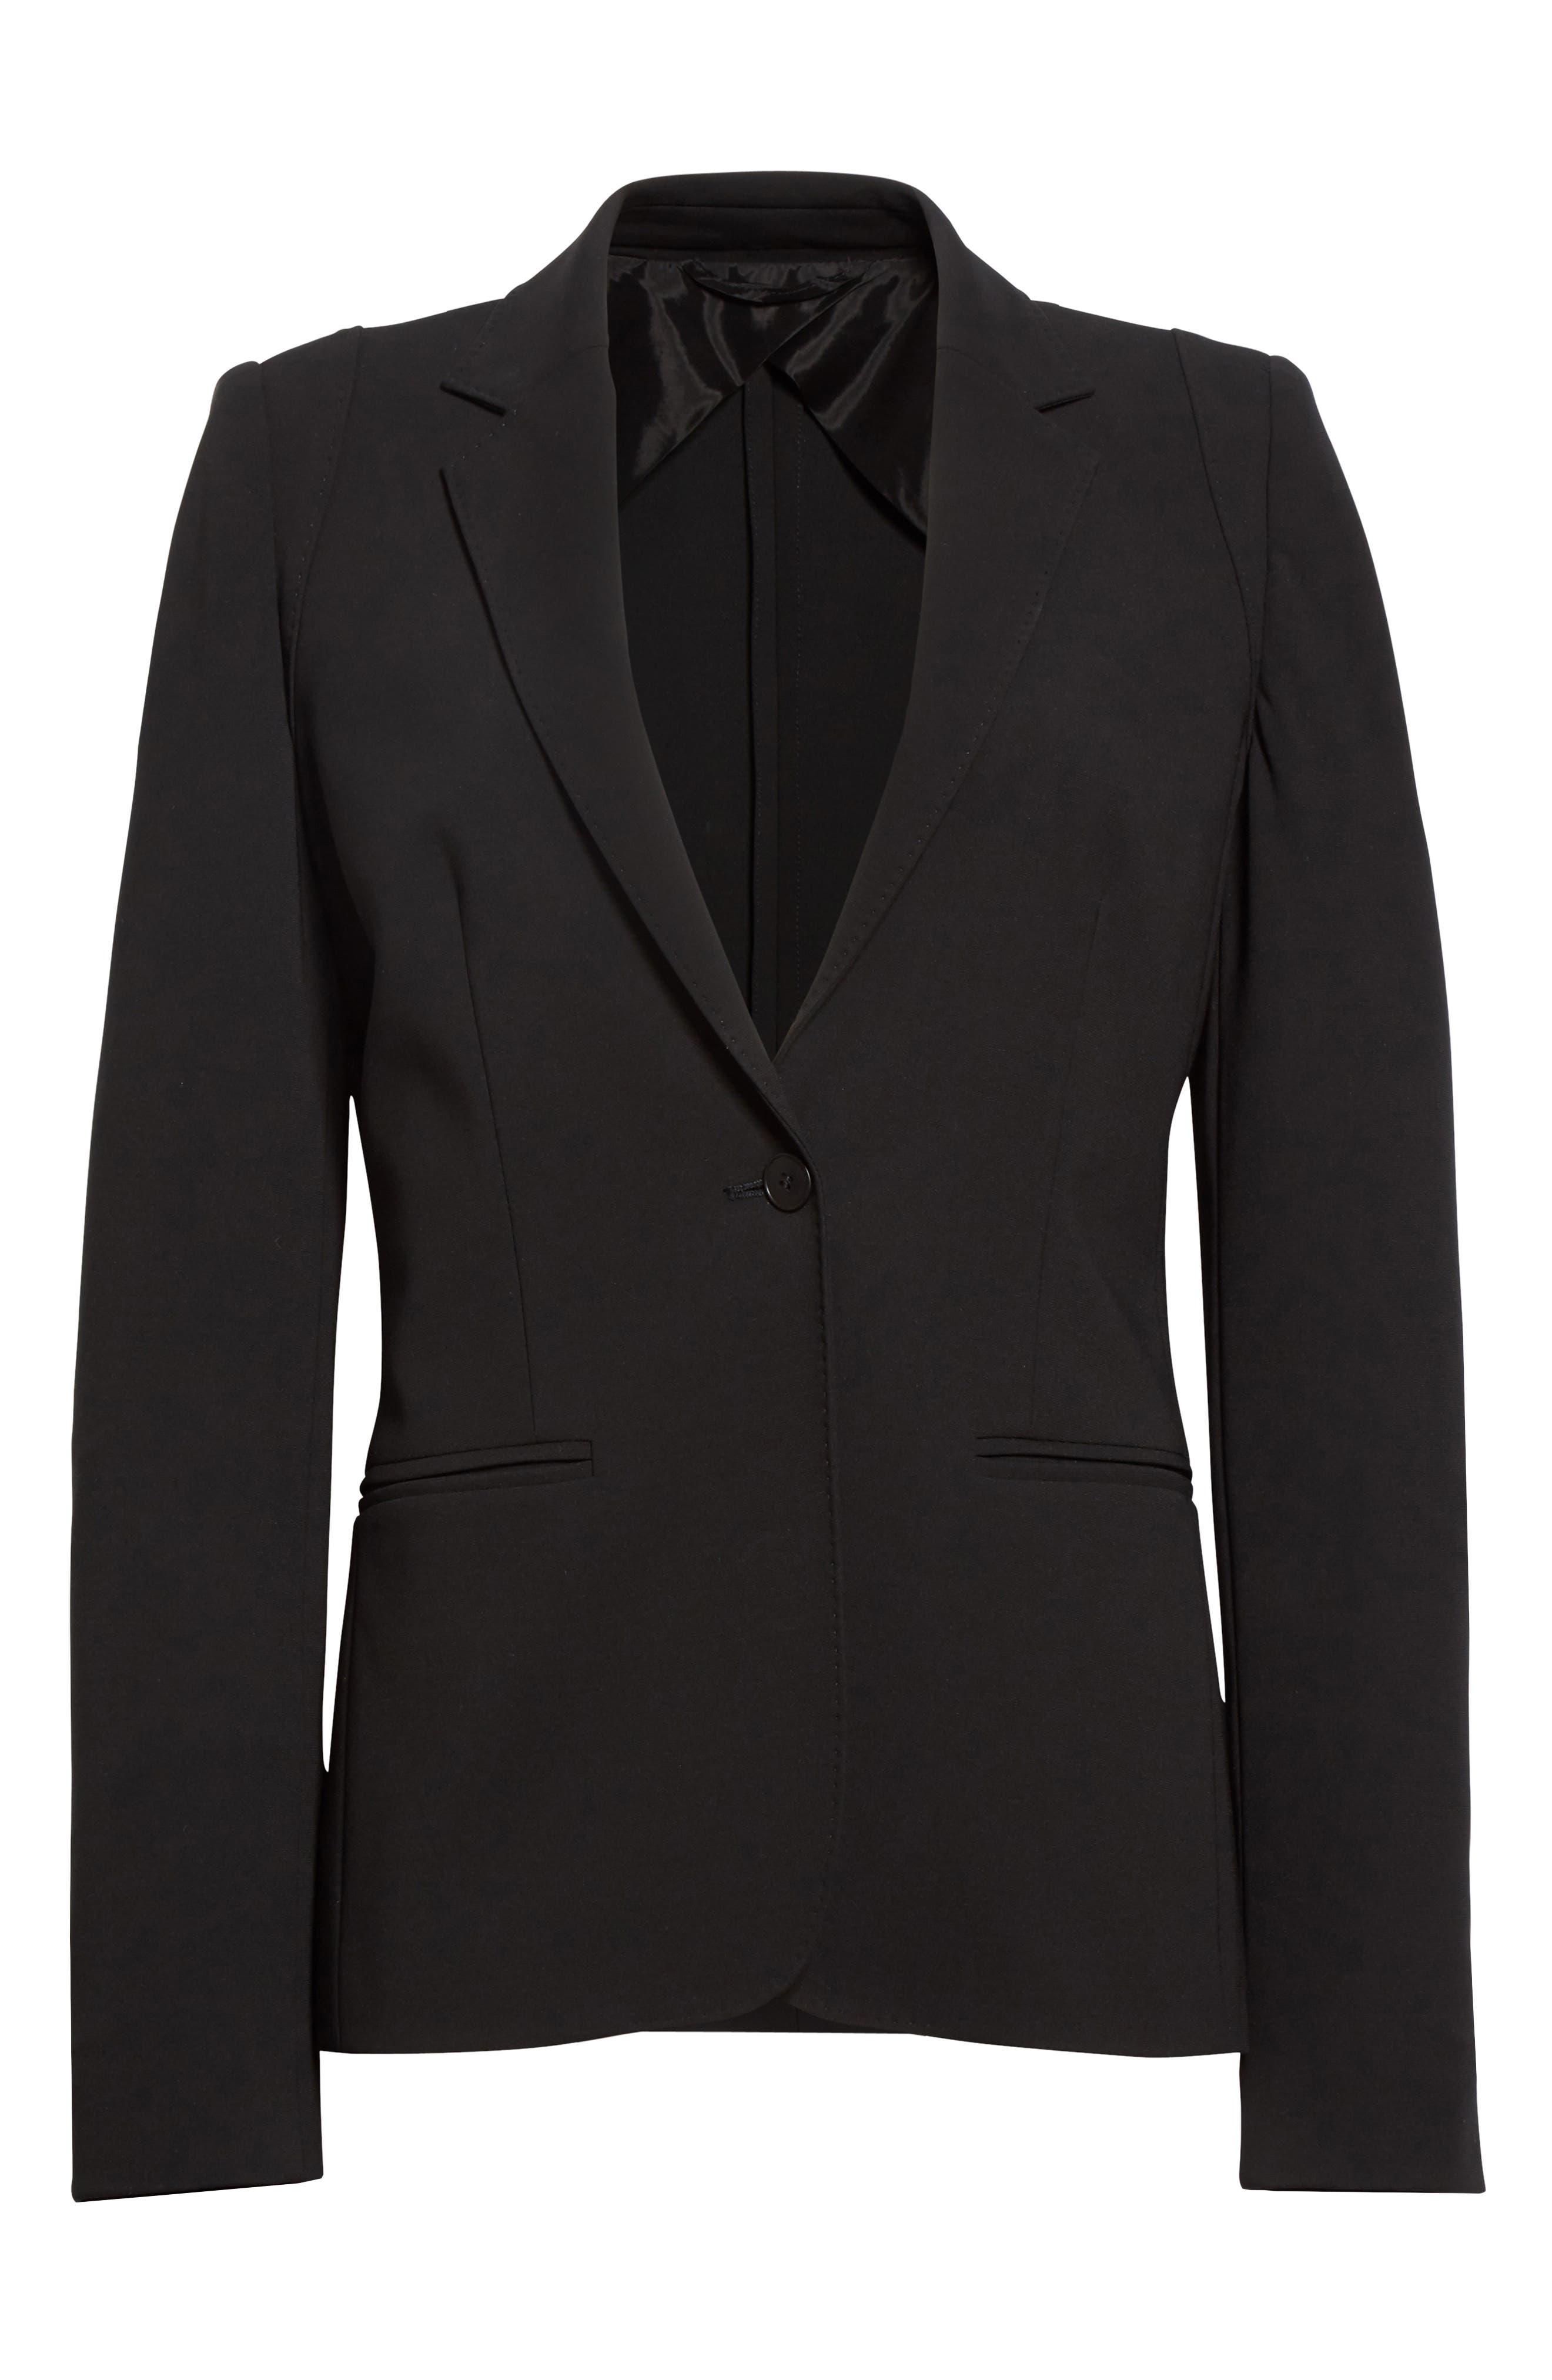 Bari Stretch Jersey Jacket,                             Alternate thumbnail 5, color,                             001